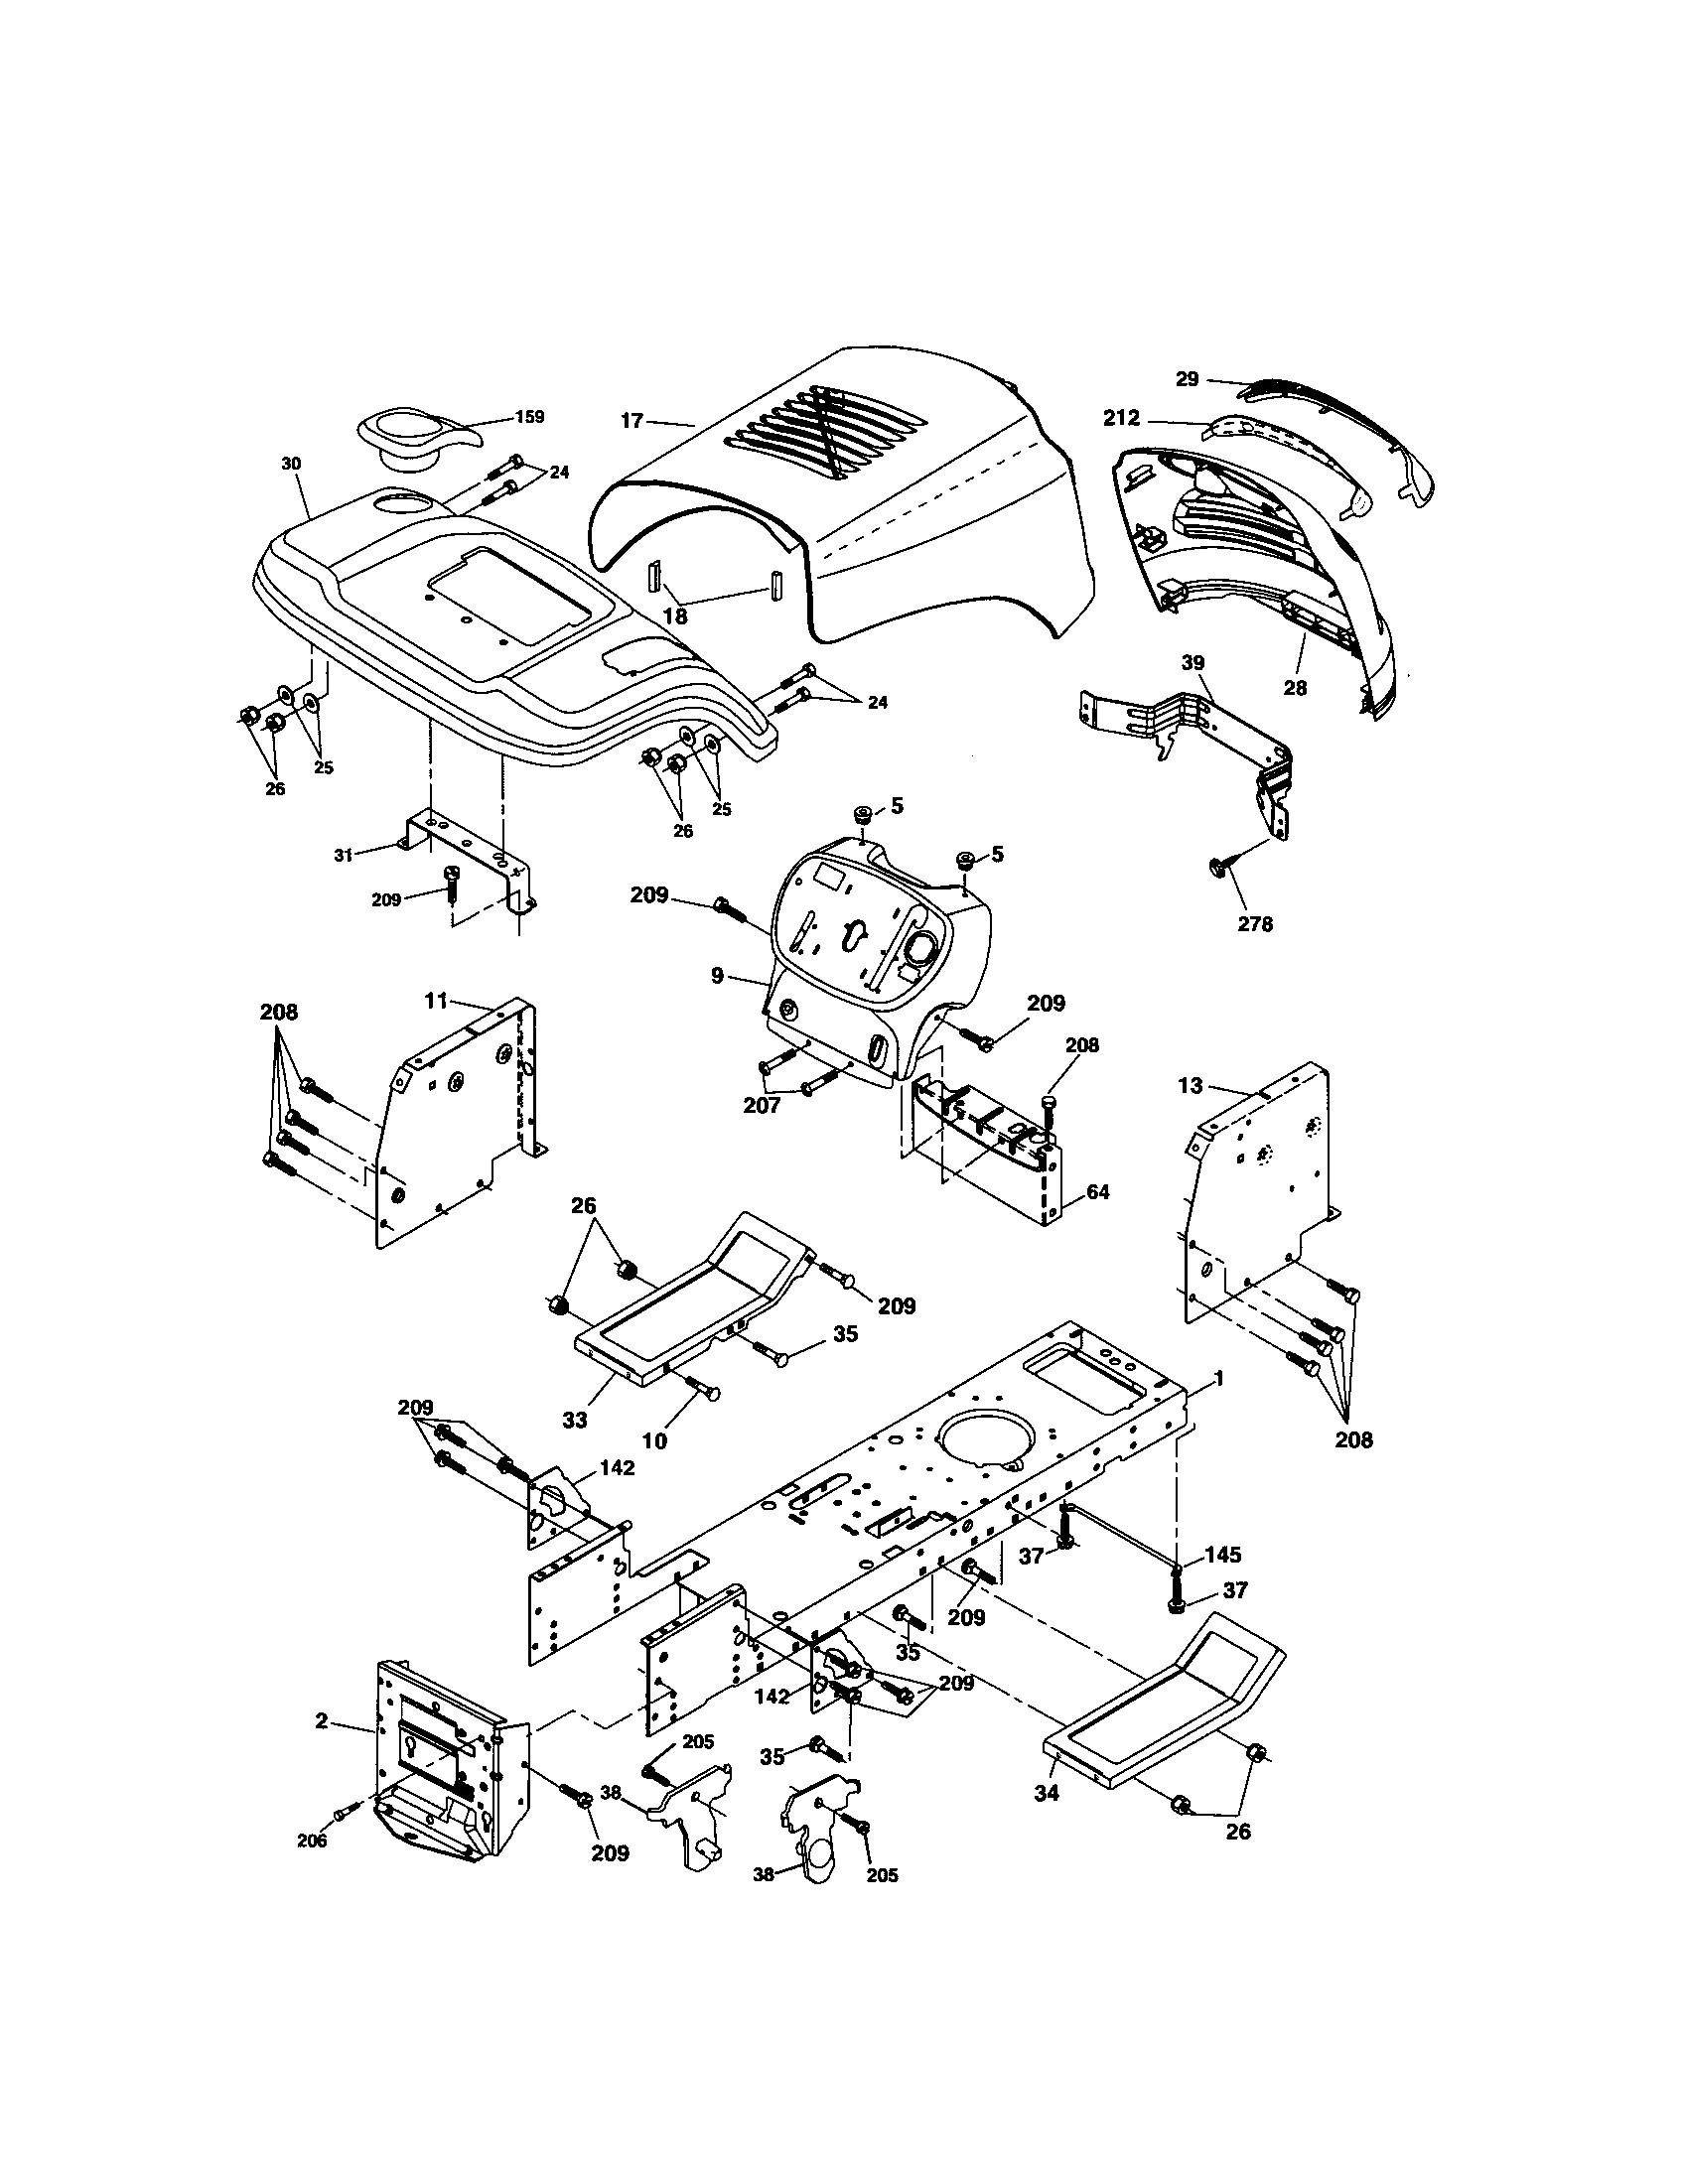 Craftsman Tractor Parts Diagram Looking for Craftsman Model Front Engine Lawn Of Craftsman Tractor Parts Diagram